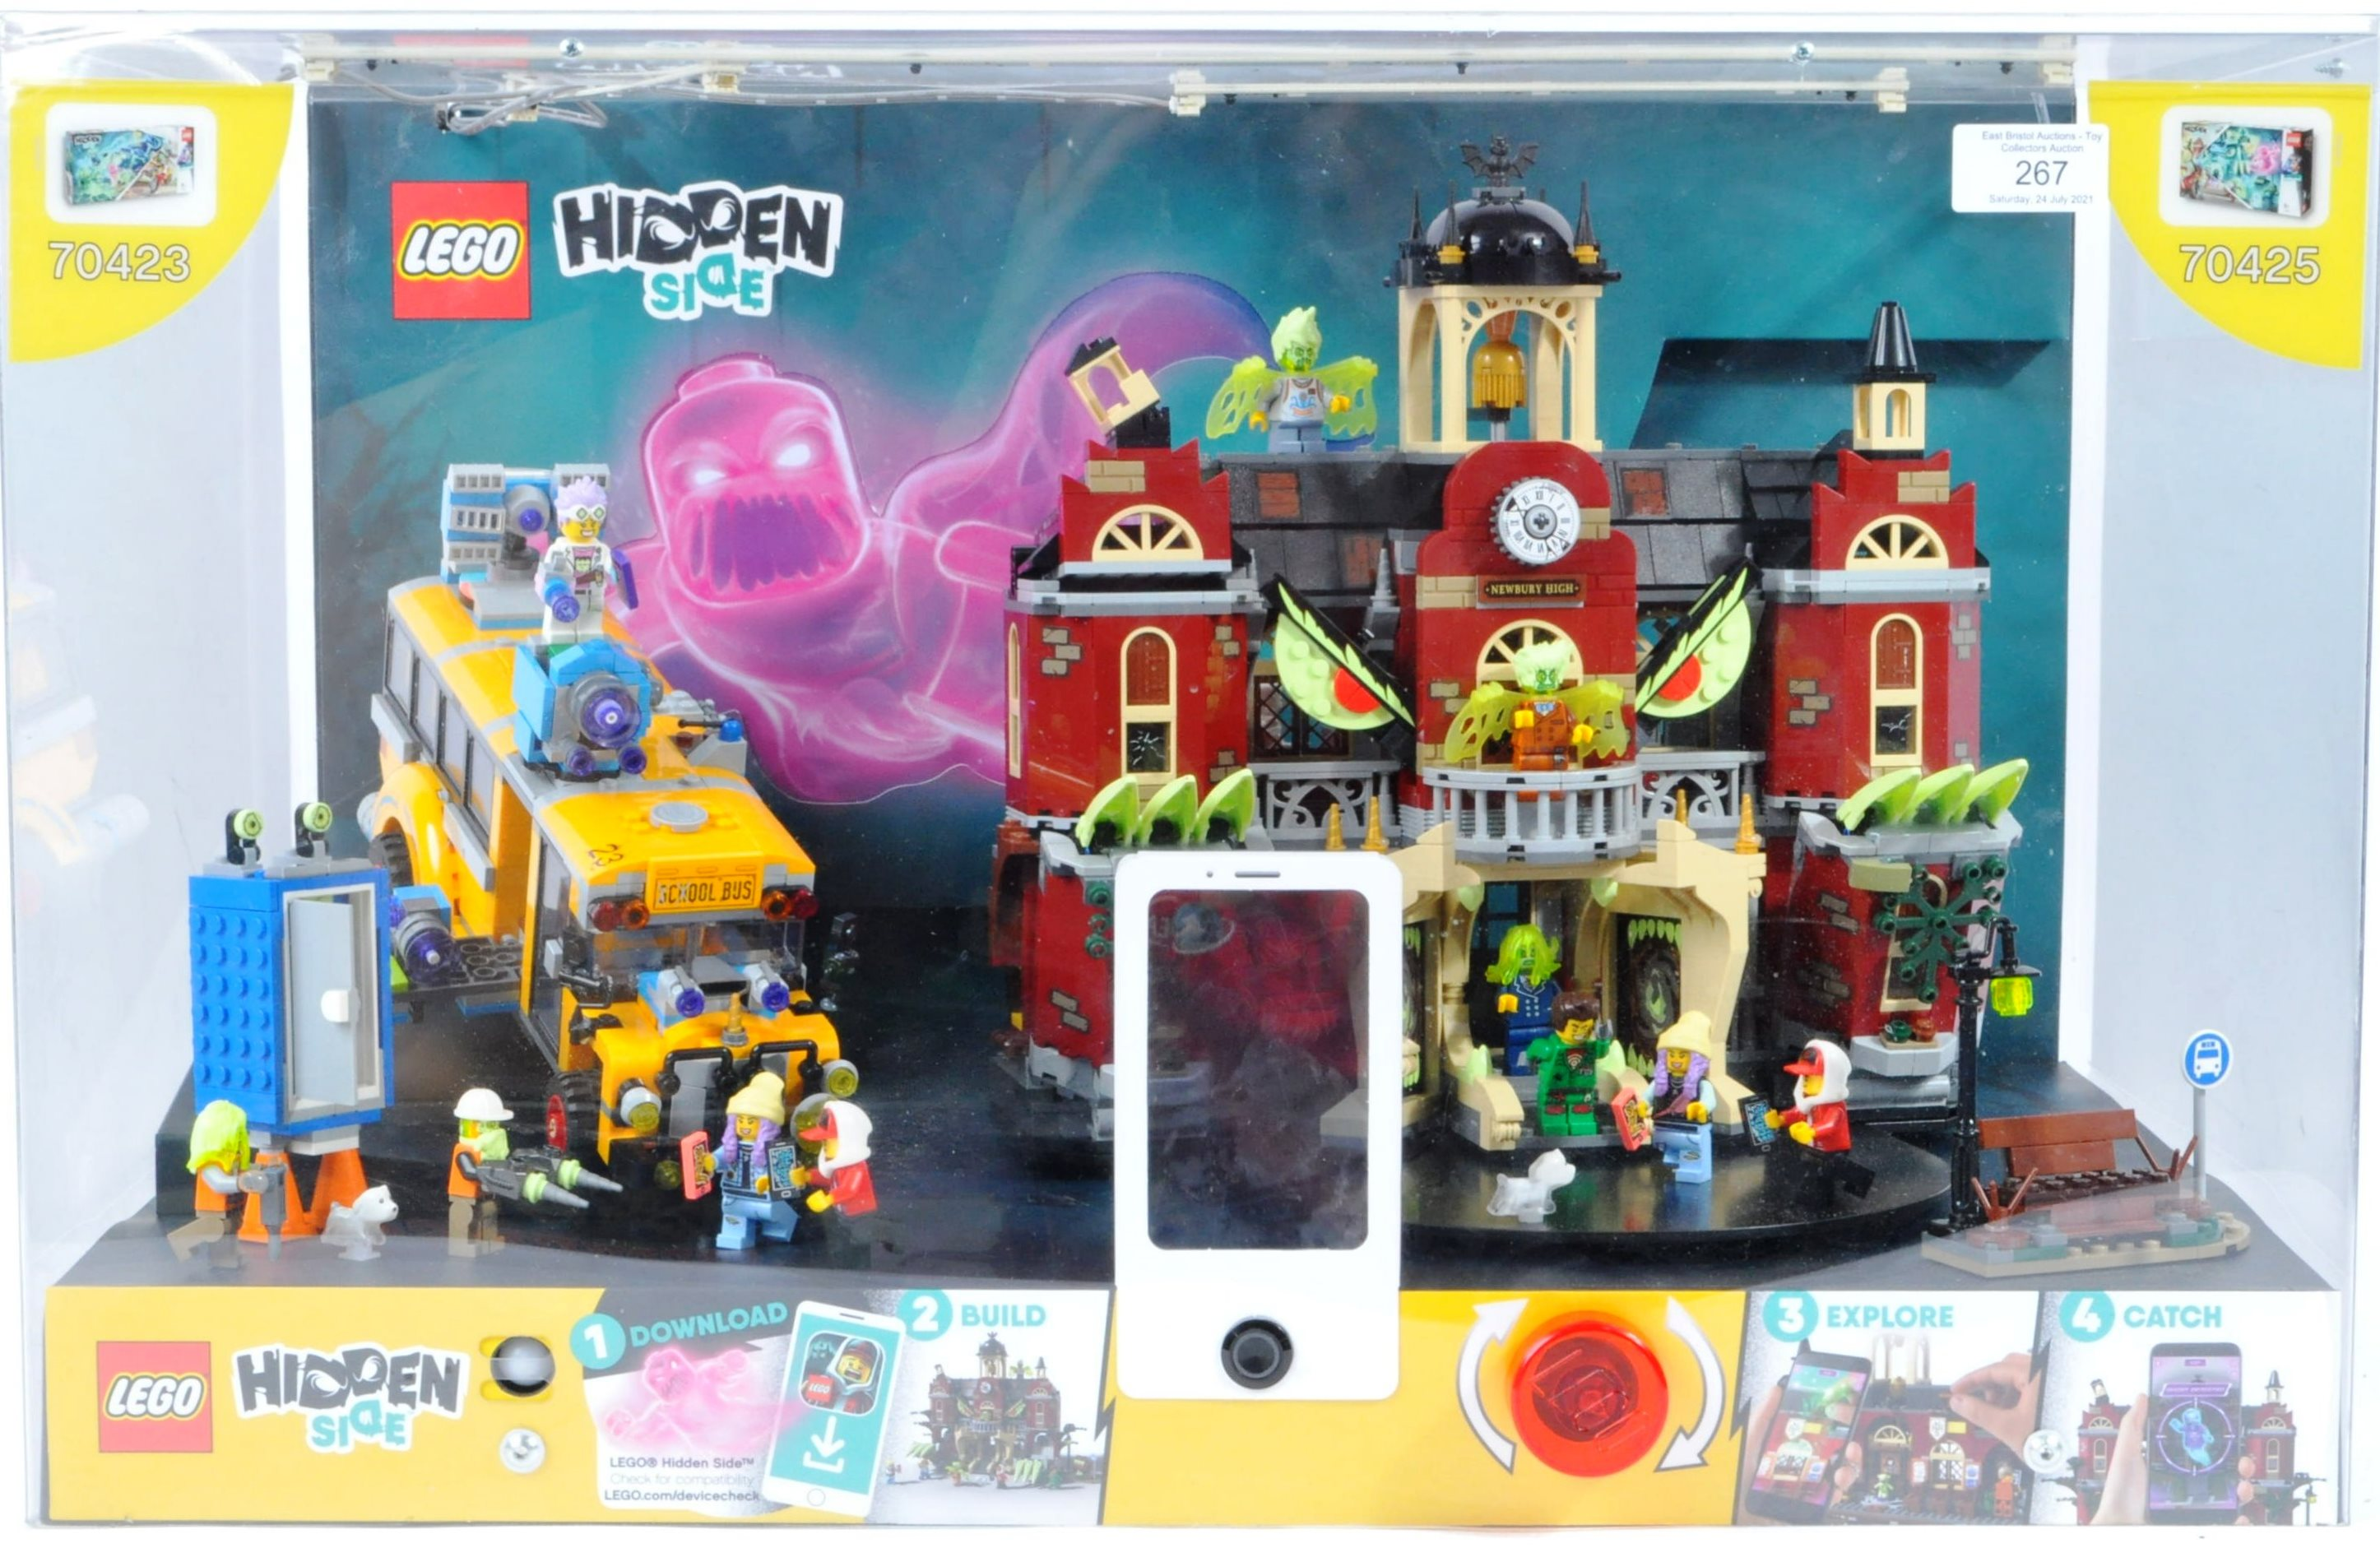 LEGO - HIDDEN SIDE - ORIGINAL IN STORE SHOP DISPLAY CABINET